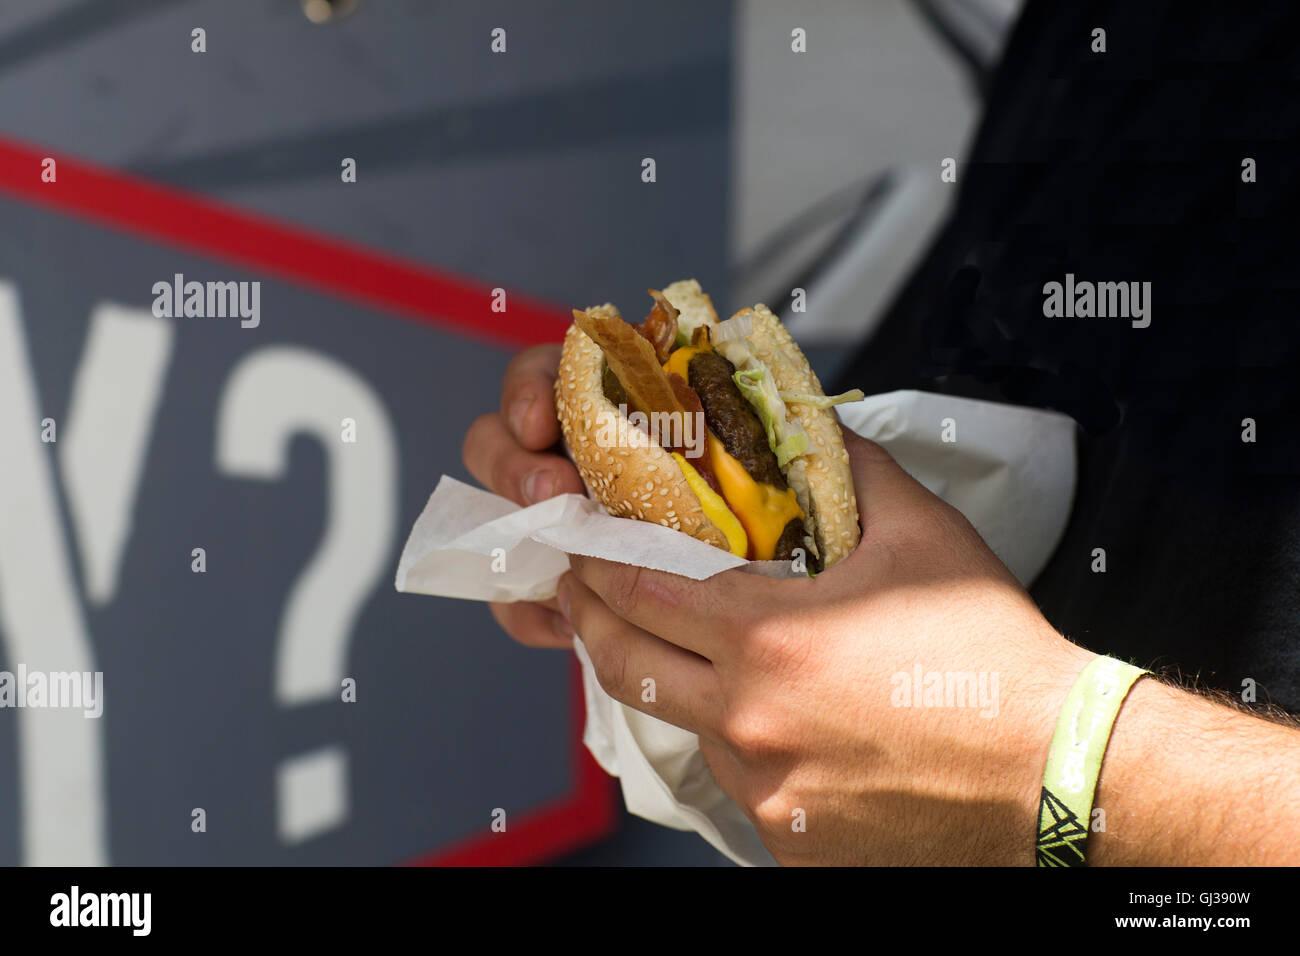 Male customer's hand eating hamburger from fast food van - Stock Image